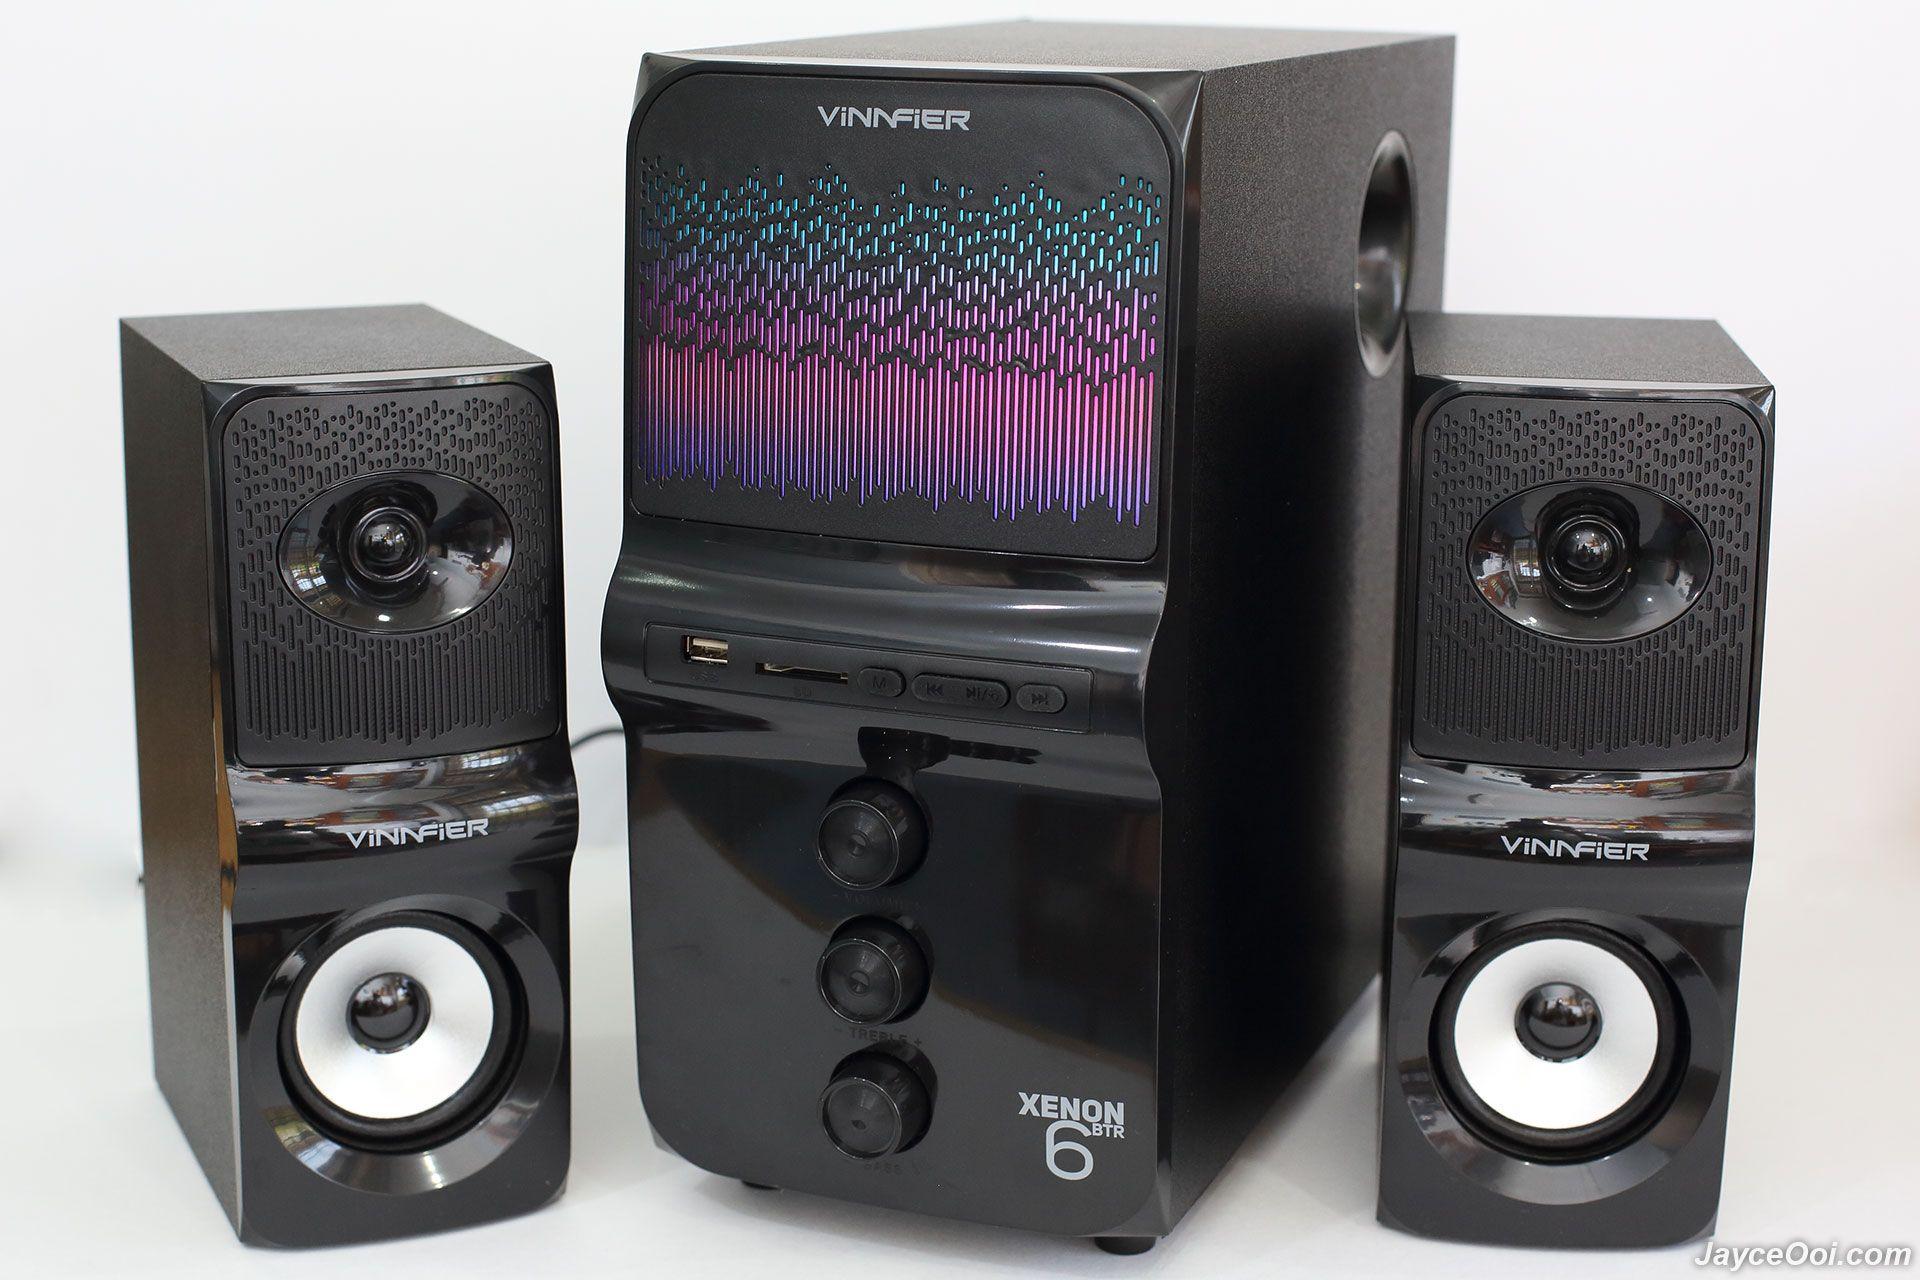 c9739ccf9ac Vinnfier Xenon 6 BTR | Review | Bluetooth